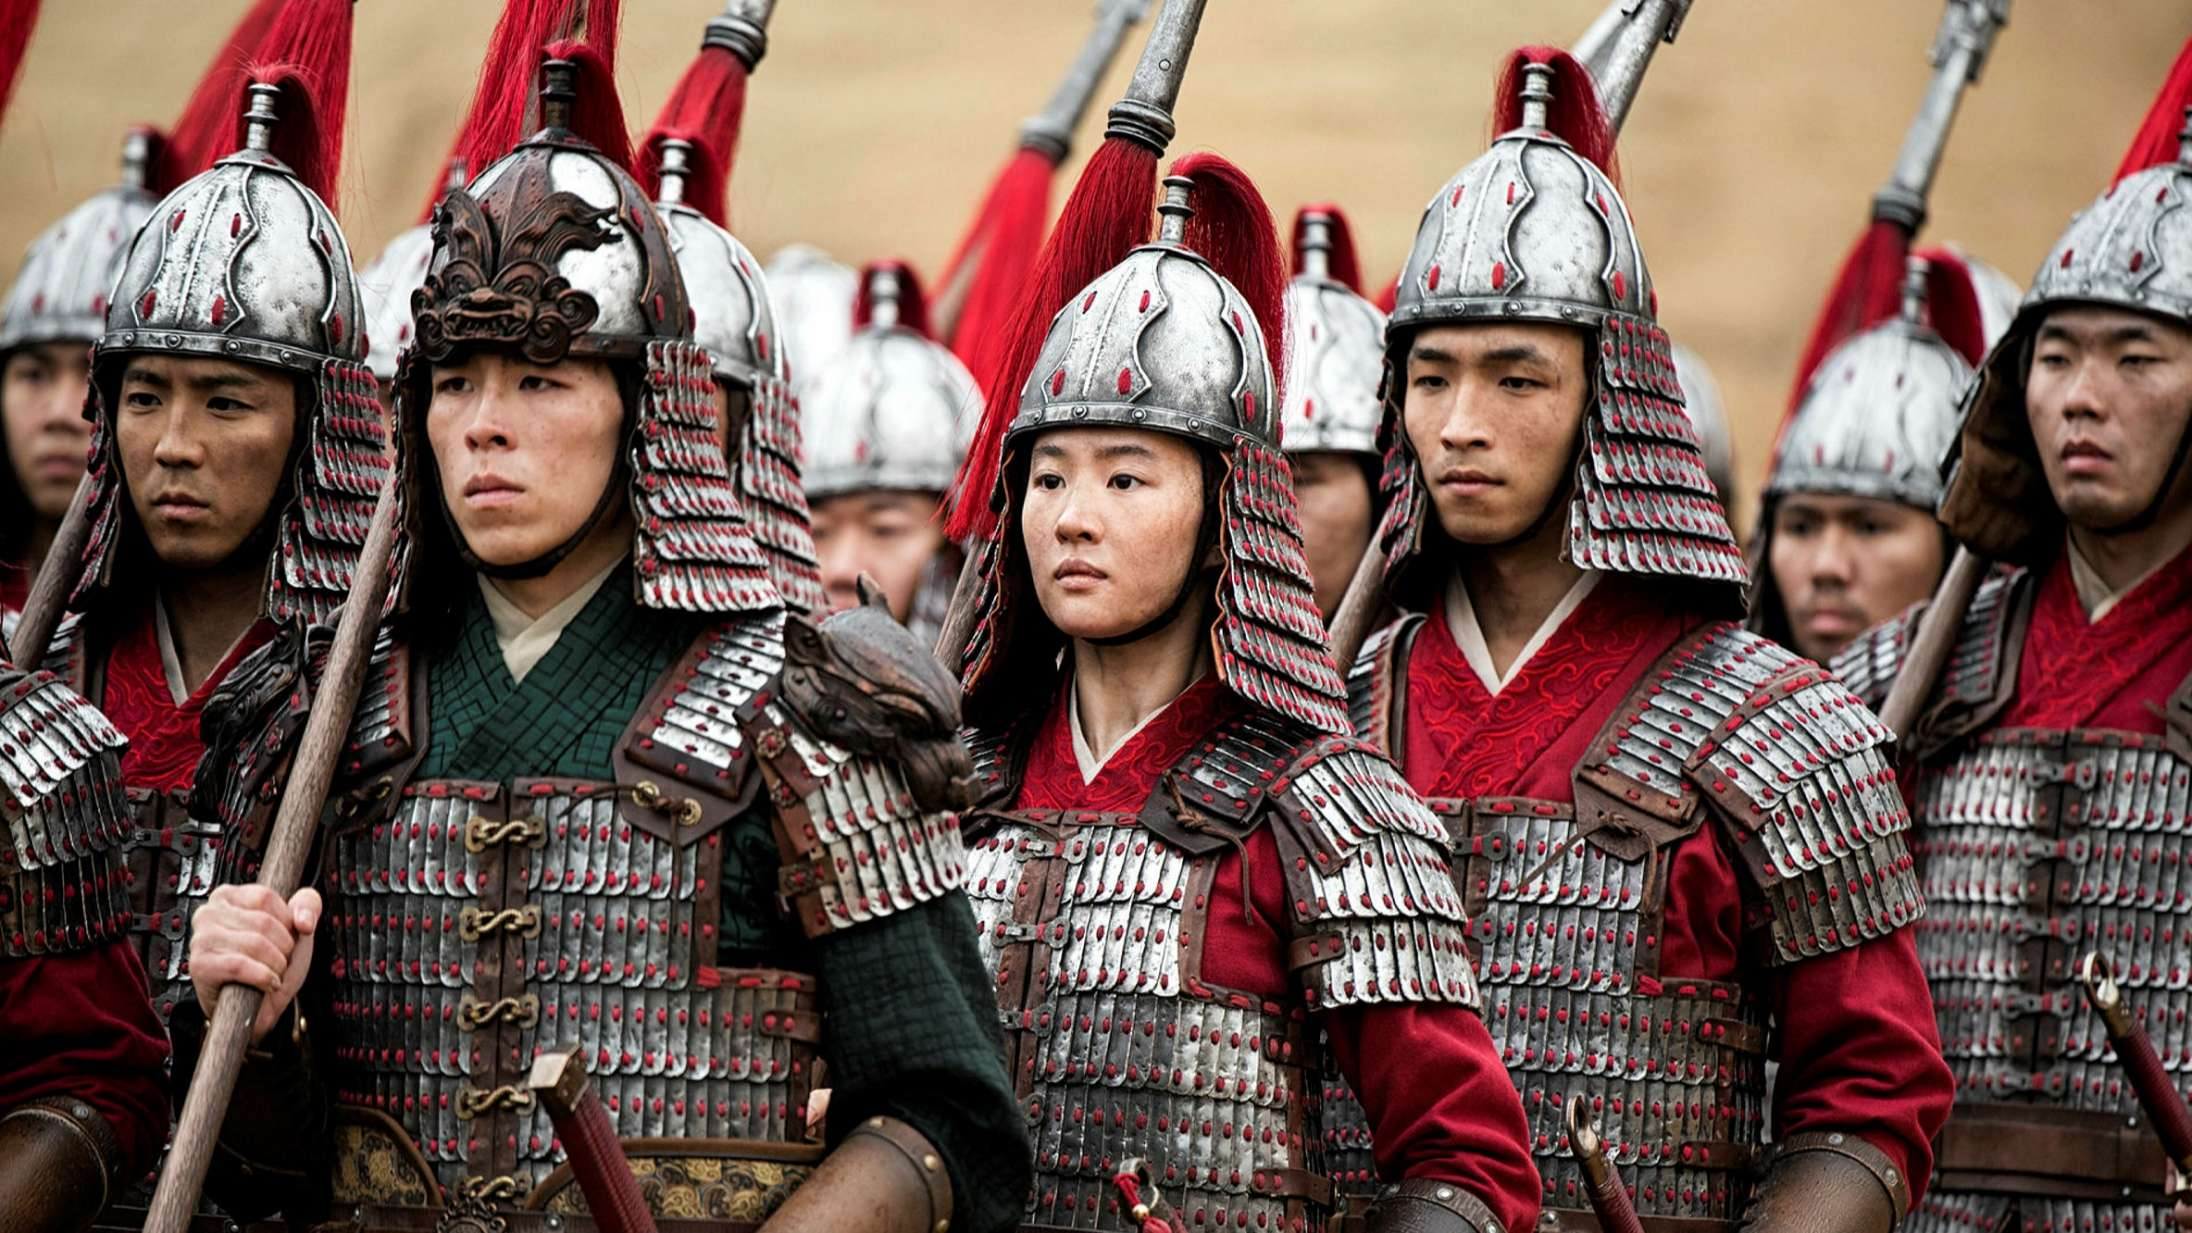 Podcasten Soundvenue Streamer: 'Mulan', 'The Undoing' og quiz-snyd for millioner